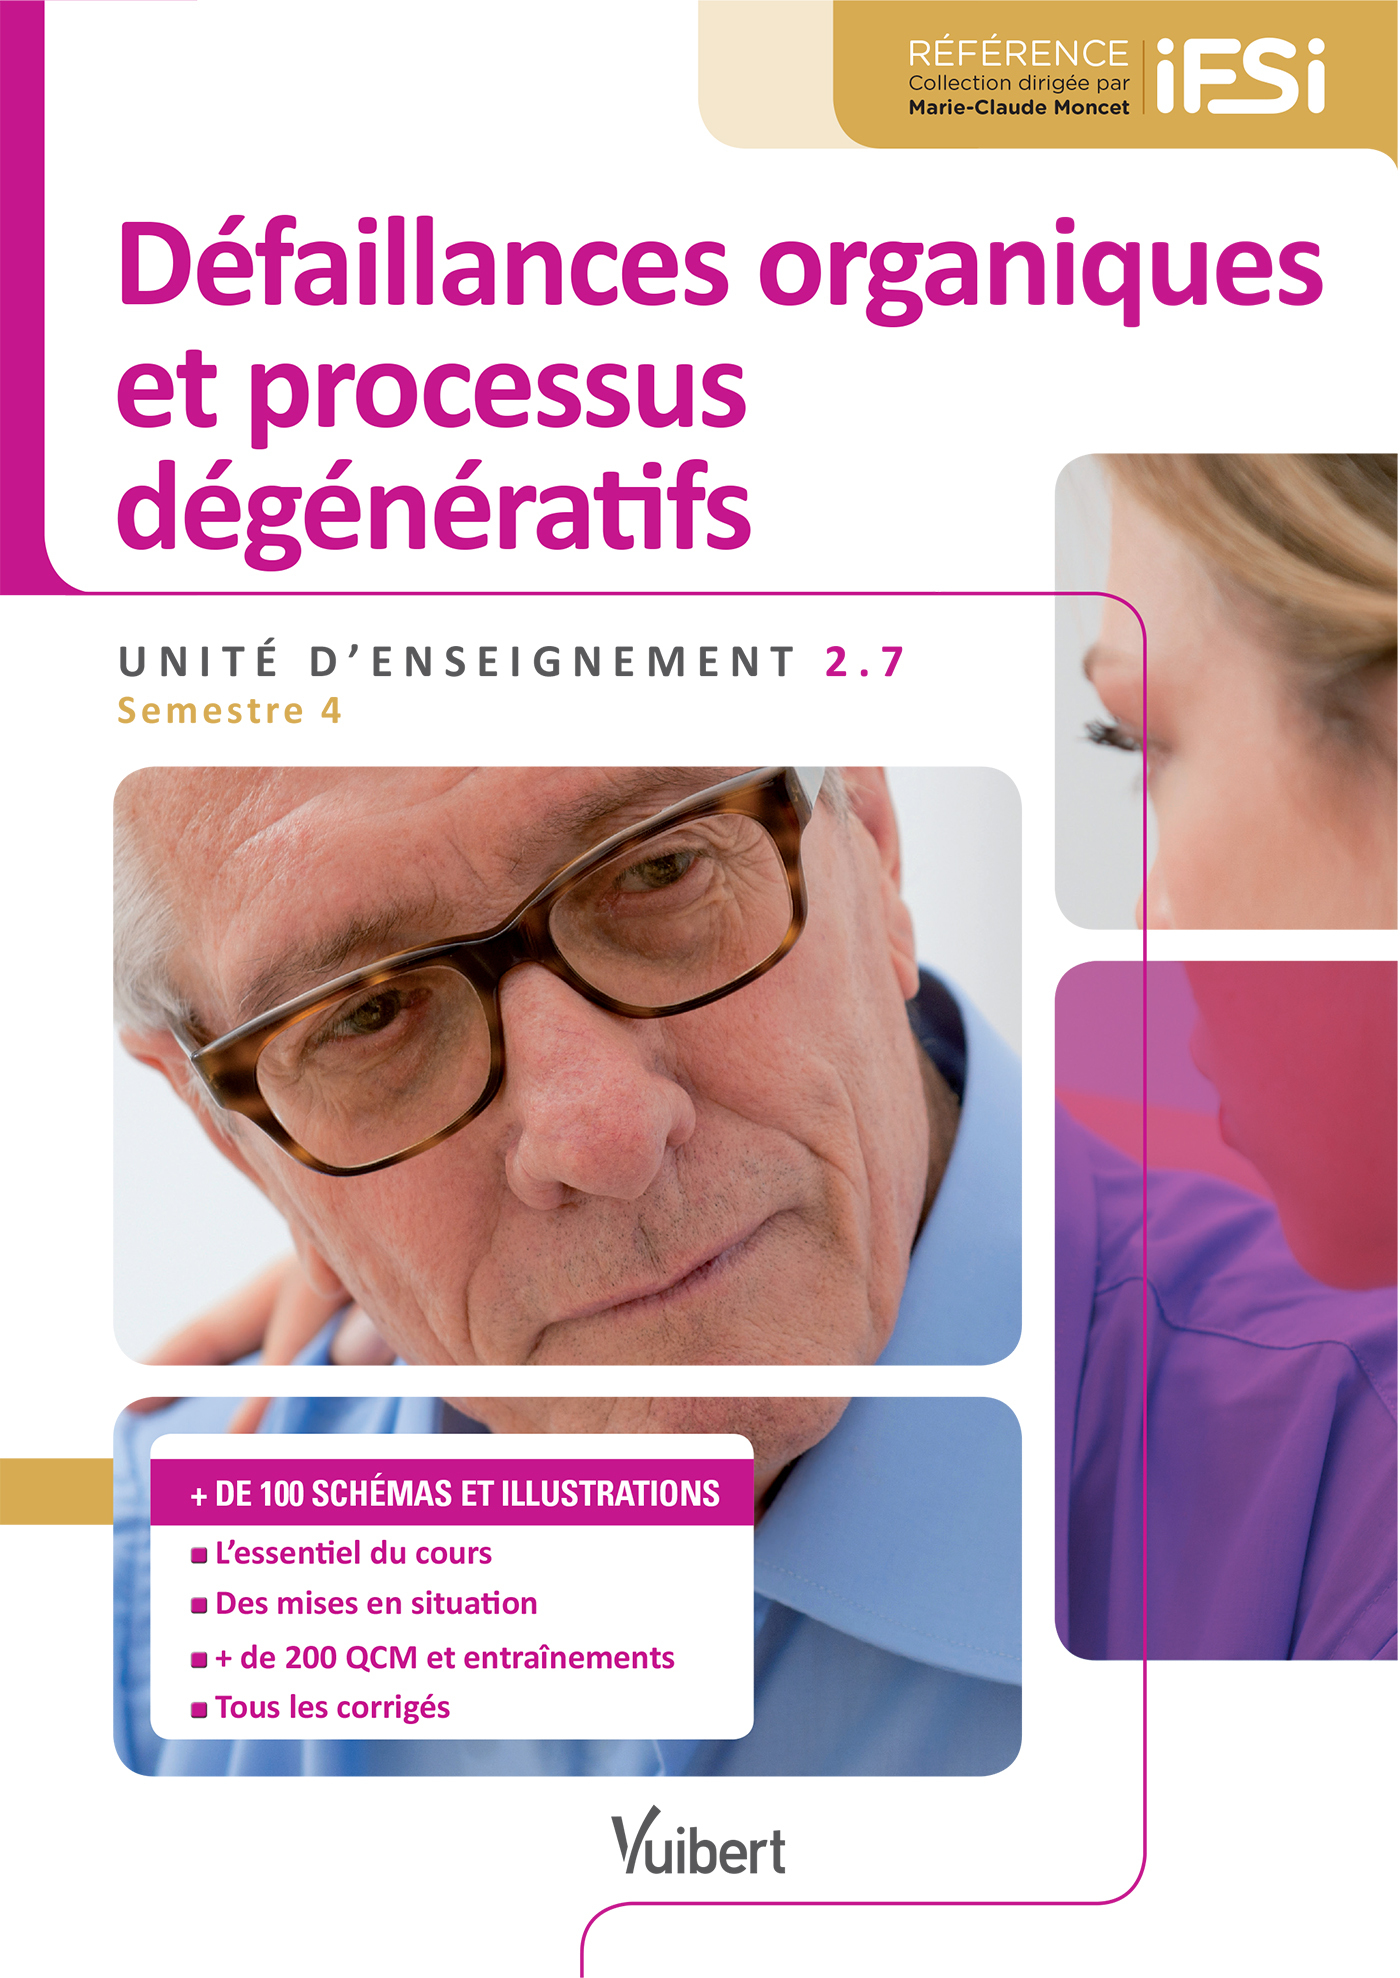 UE 2.7 DEFAILLANCES ORGANIQUES ET PROCESSUS DEGENERATIFS